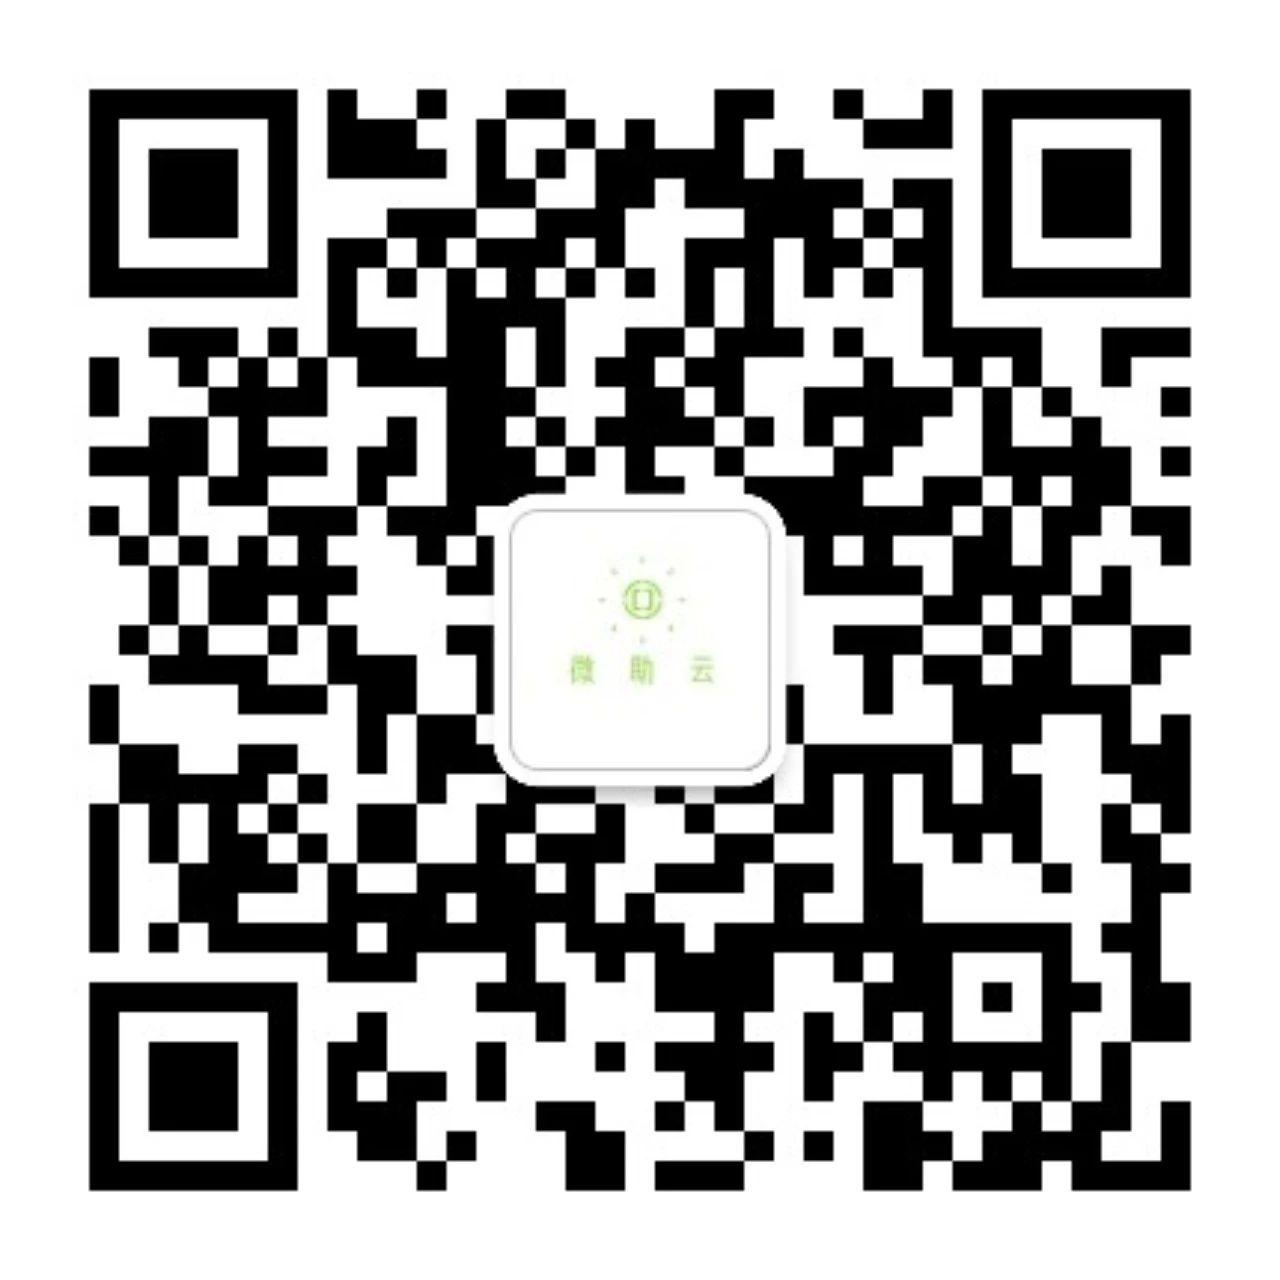 images/324/2020/05/qrv7s27b6l47v47B39PPrLPtPrxF6R.jpg